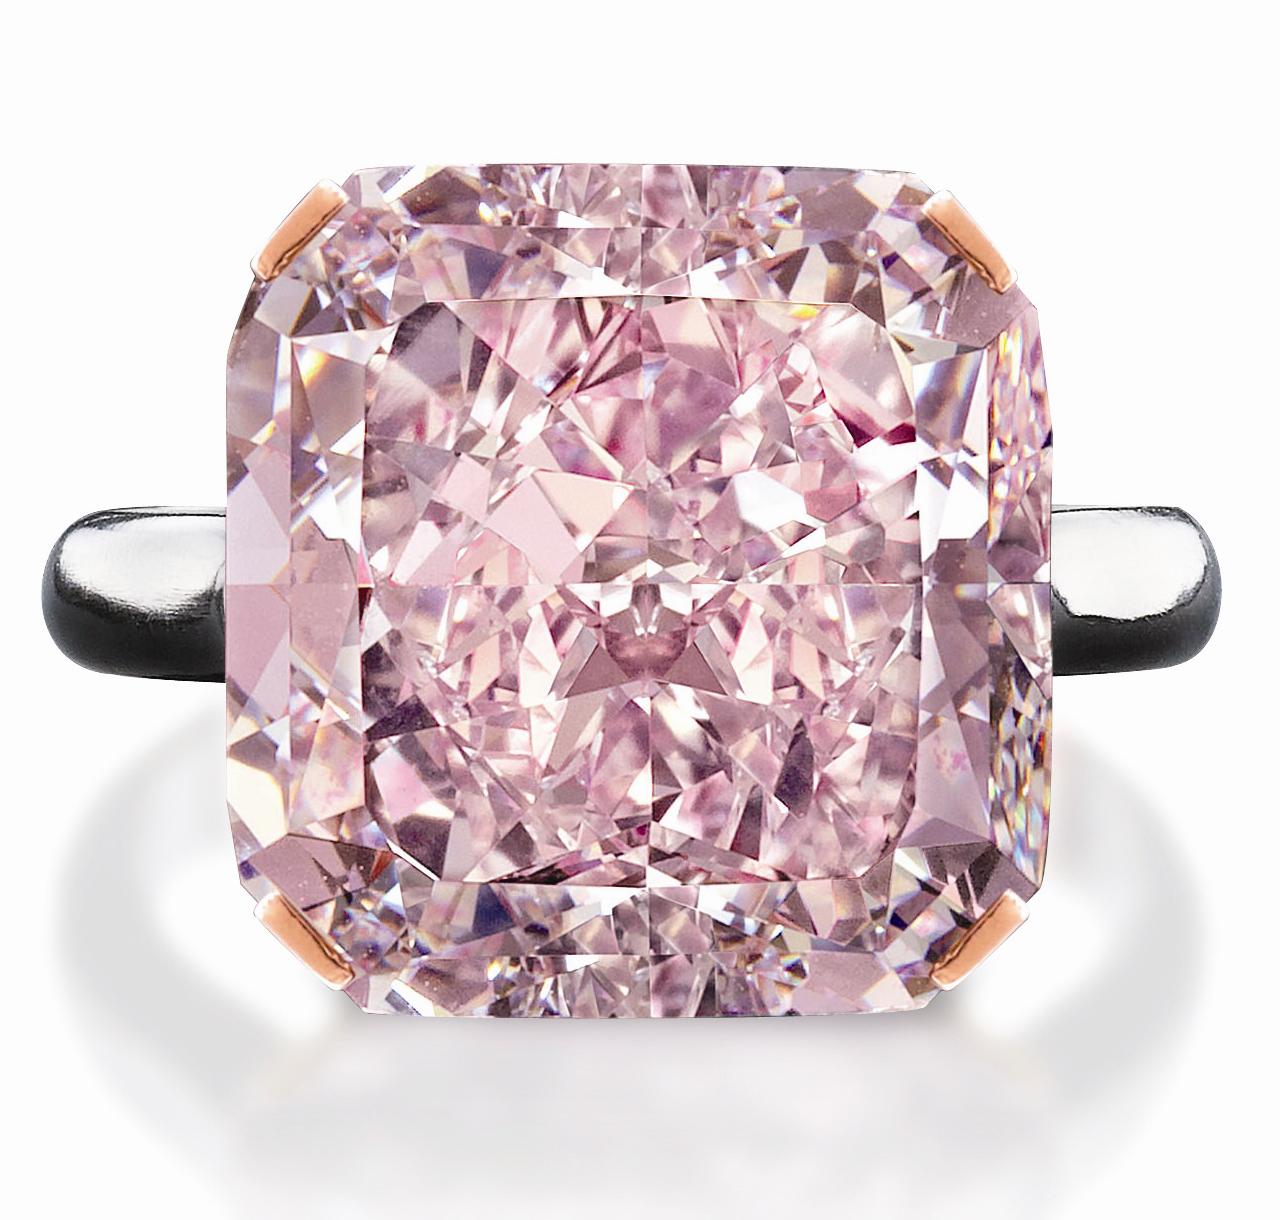 Edmonton Jeweler to Display 10 Ct Pink Diamond News Jewelry Network